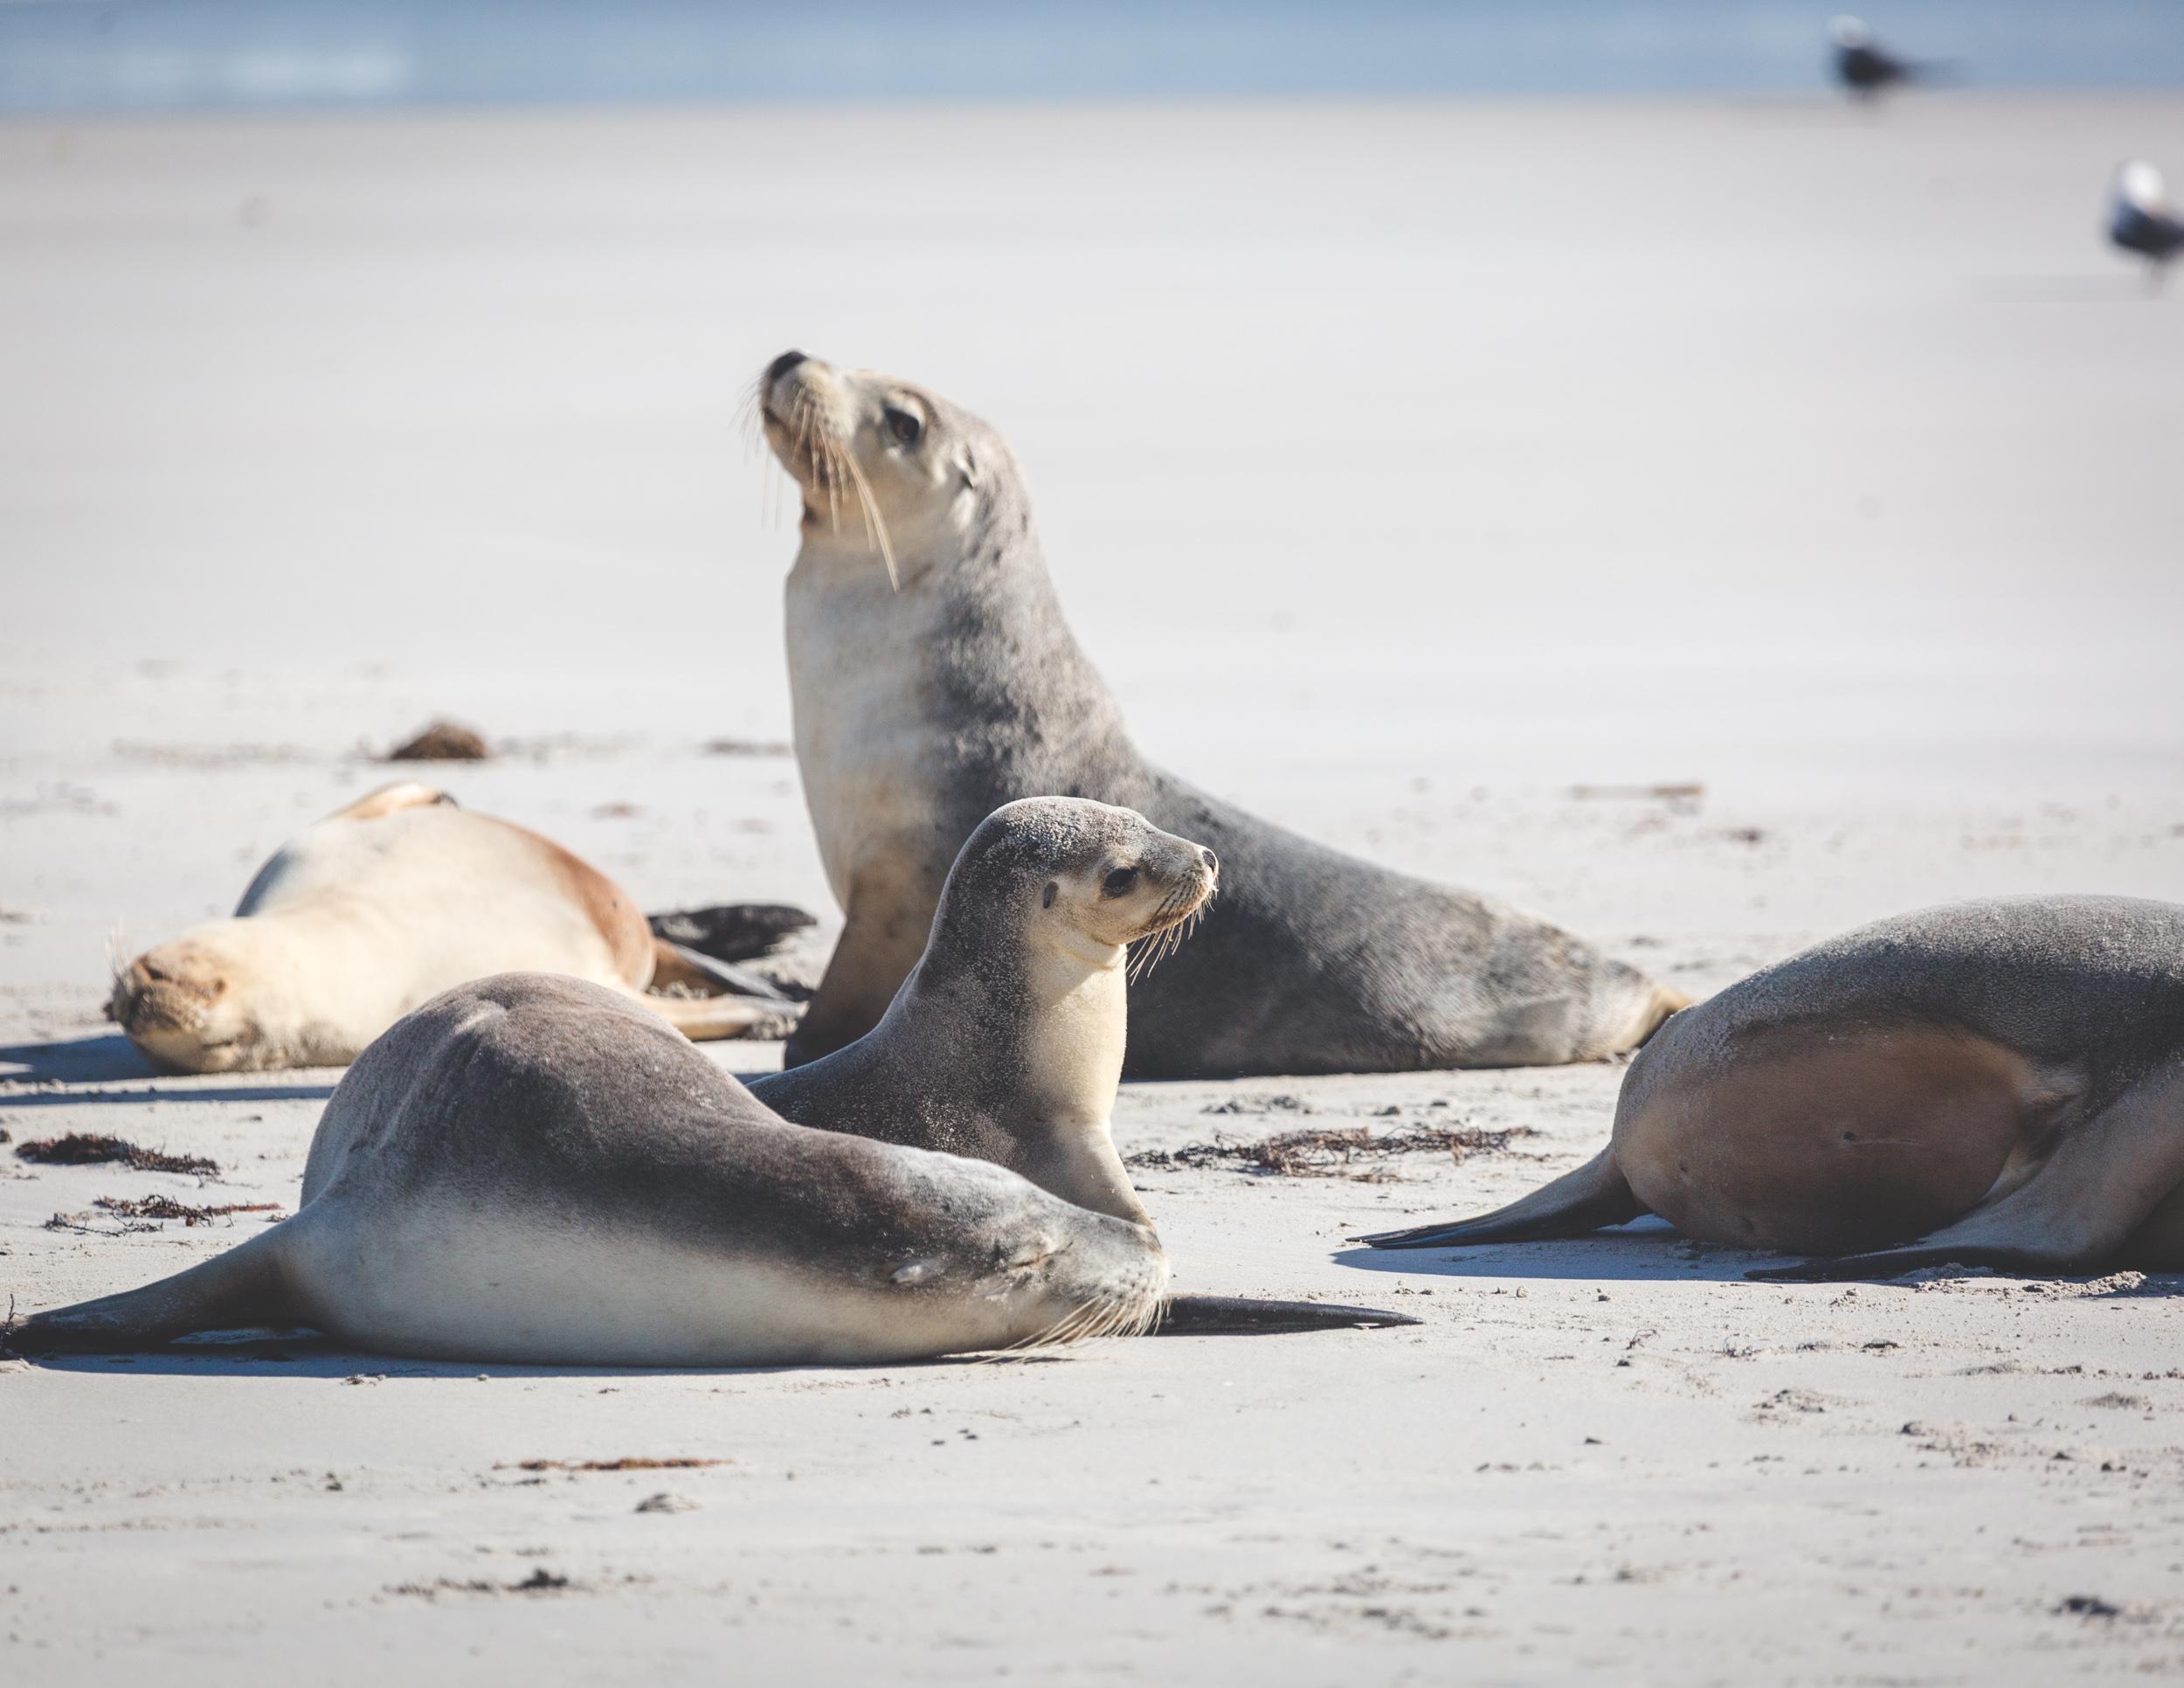 Best things to do in Kangaroo Island: Seal Bay